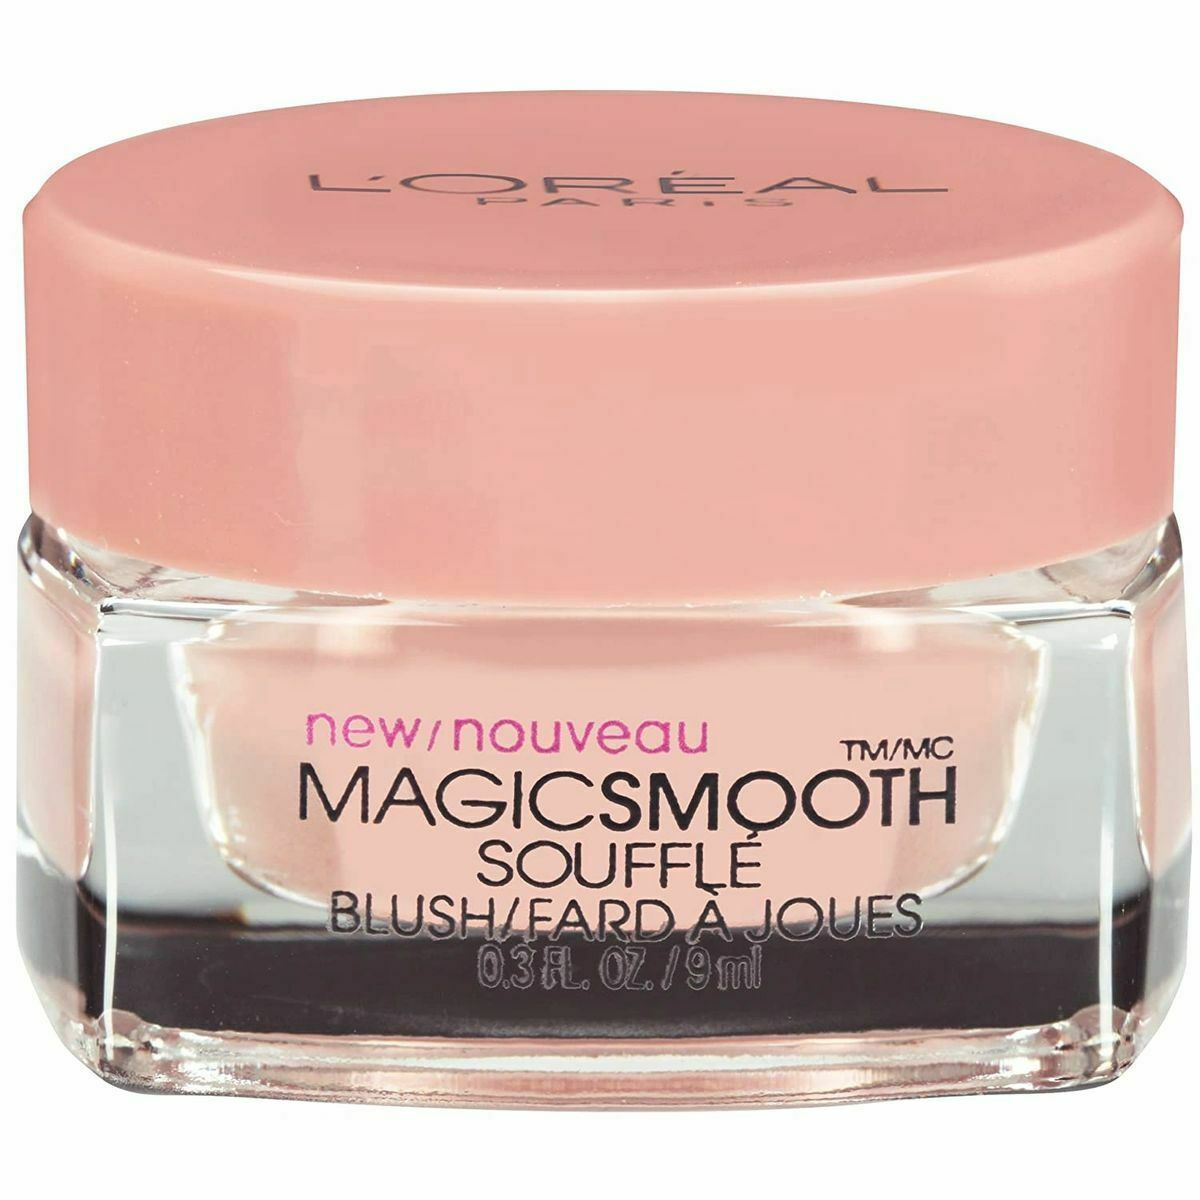 L'Oreal Paris Magic Smooth Souffle Blush, Celestial, 0.30 Ounces - $21.72